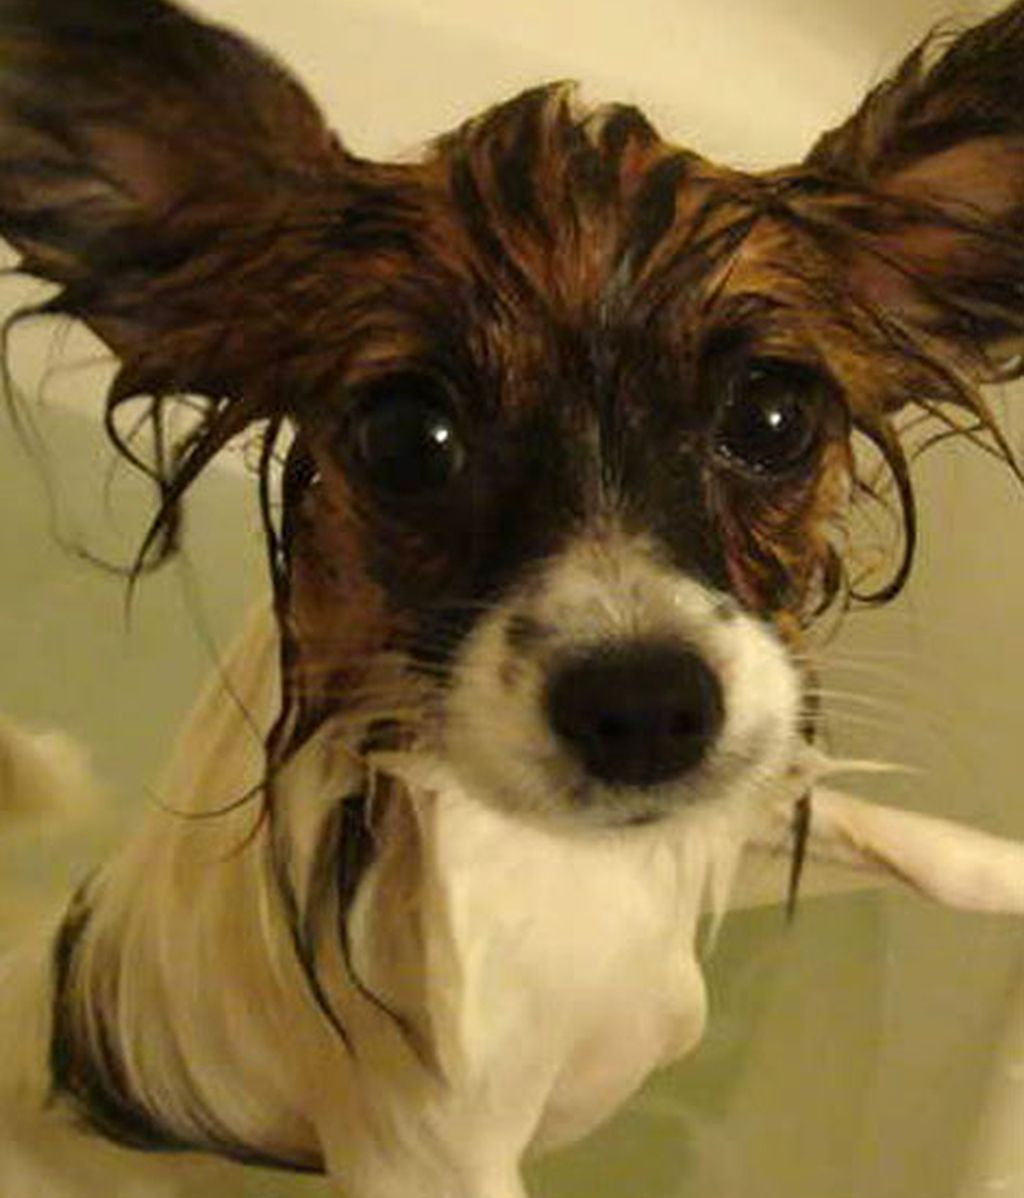 ¡Odio bañarme!